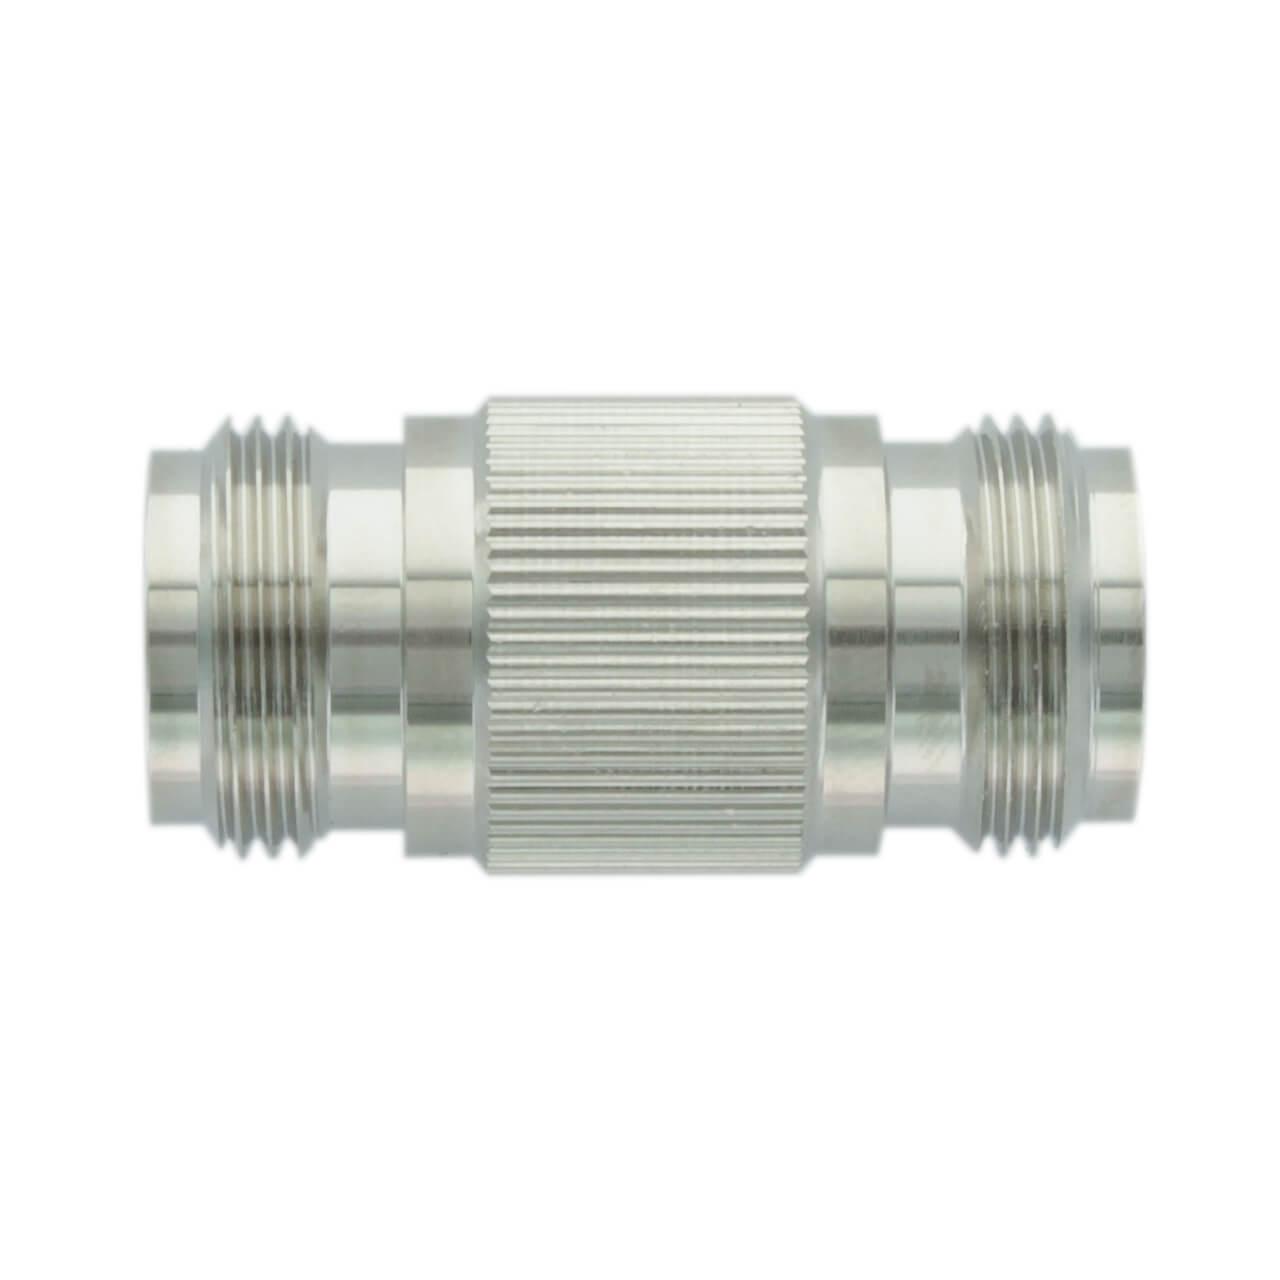 N-female to N-female Barrel Connector